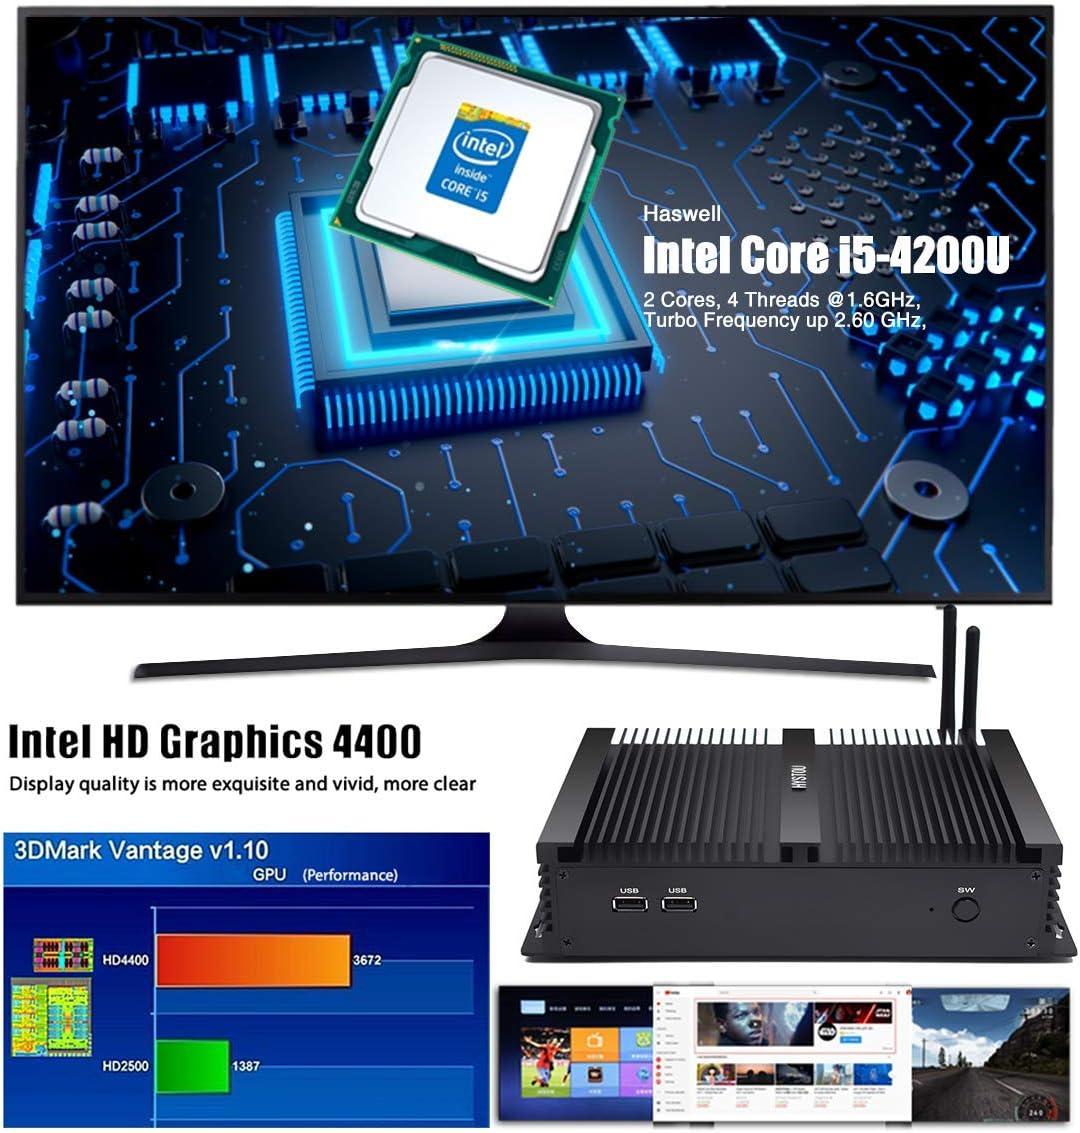 HYSTOU Fanless Mini PC Windows 10,Intel Core i5 4200U,Porte seriali multiple,8GB DDR3+256GB SSD,HDMI VGA USB*4 Custodia in alluminio 4K Display WiFi Bluetooth